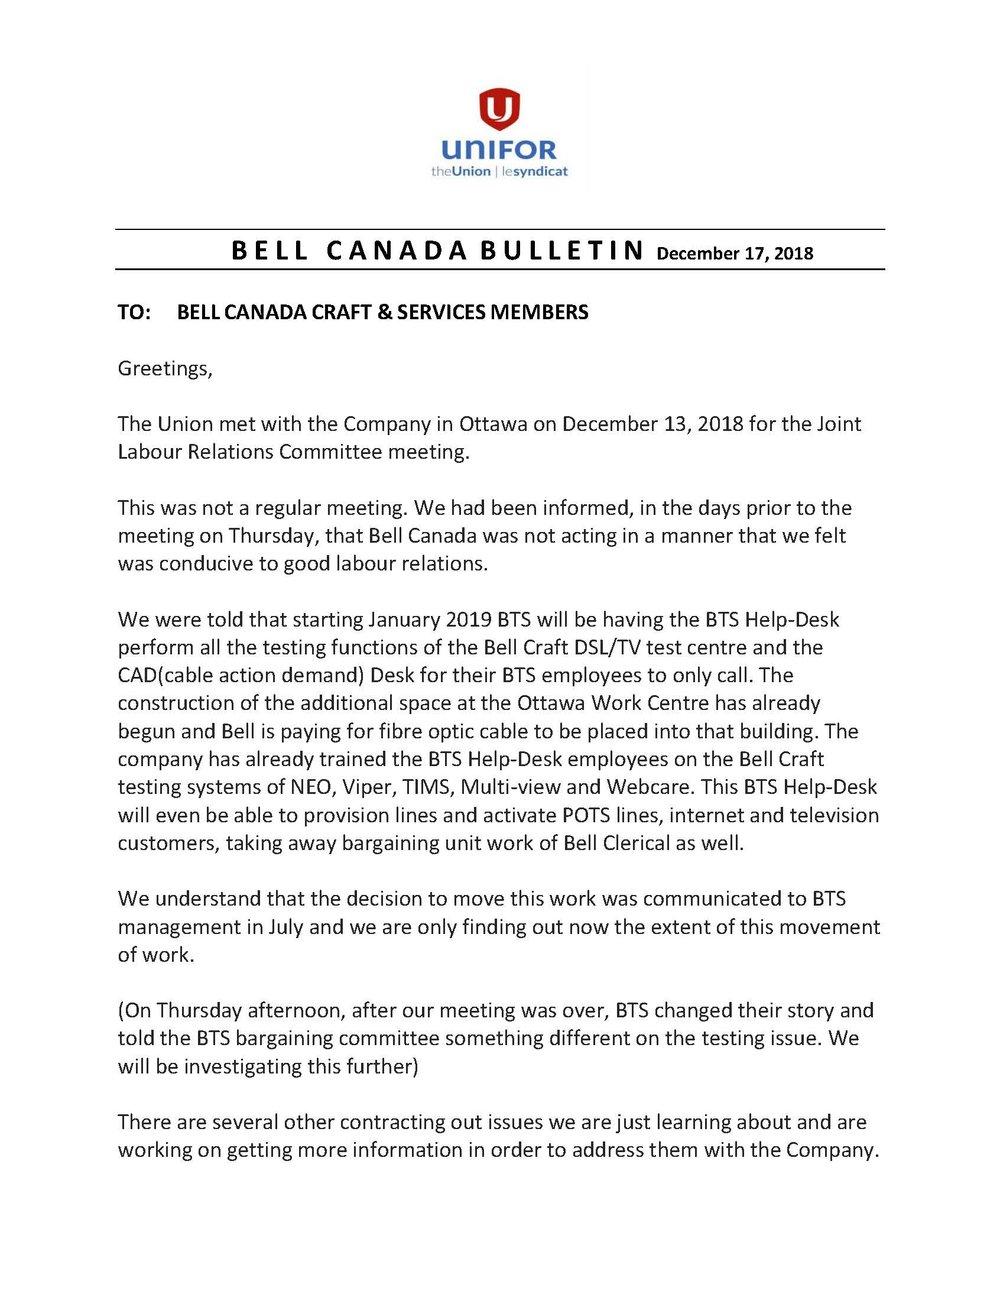 Bulletin Bell Canada Craft & Services - December 2018.jpg